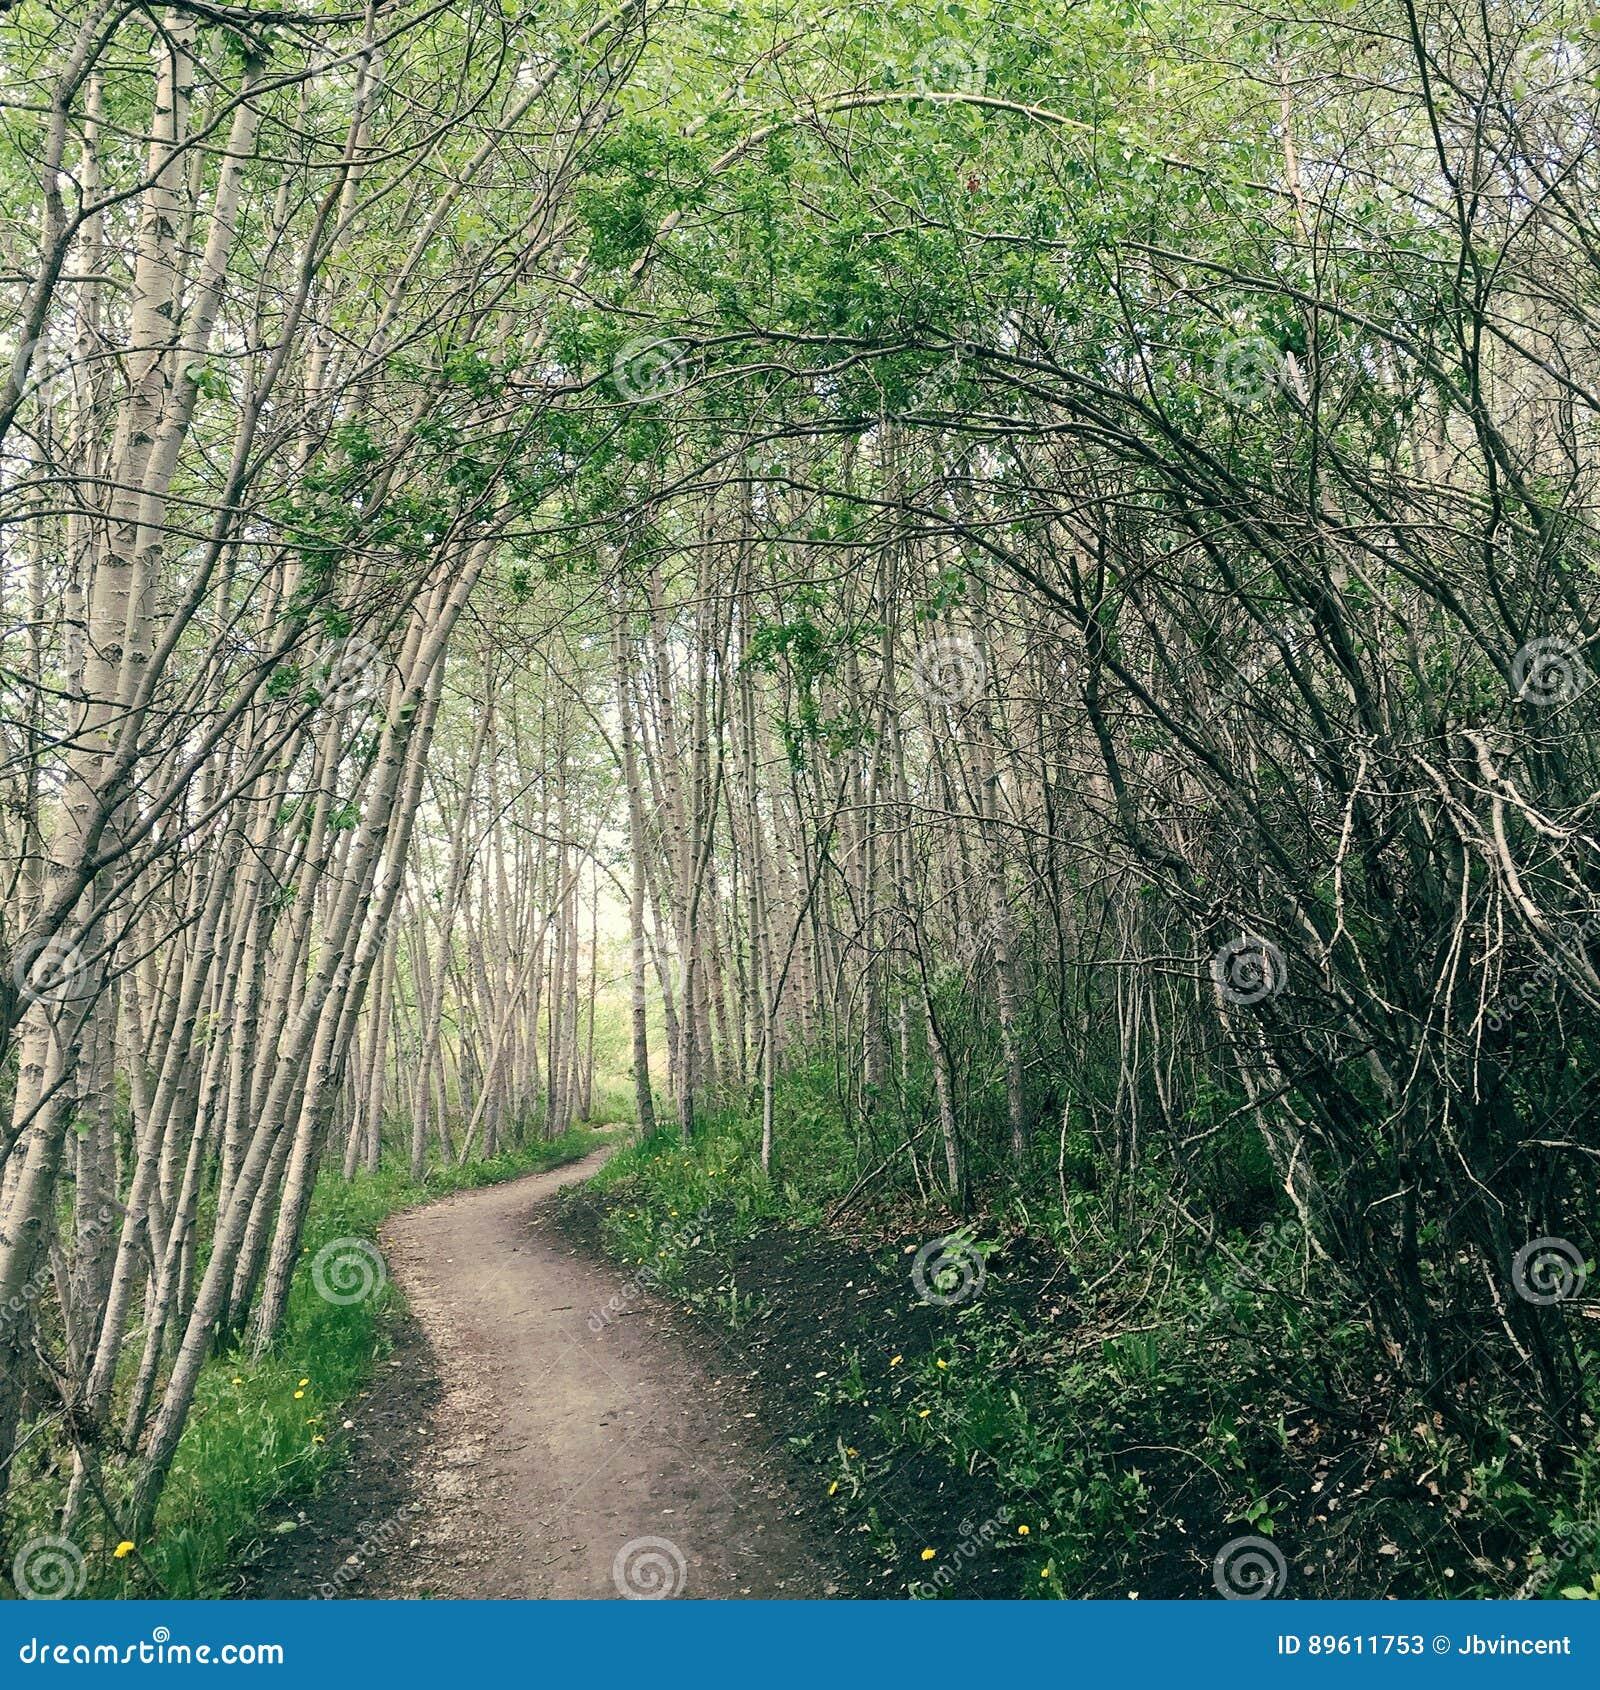 Mystical forest trail